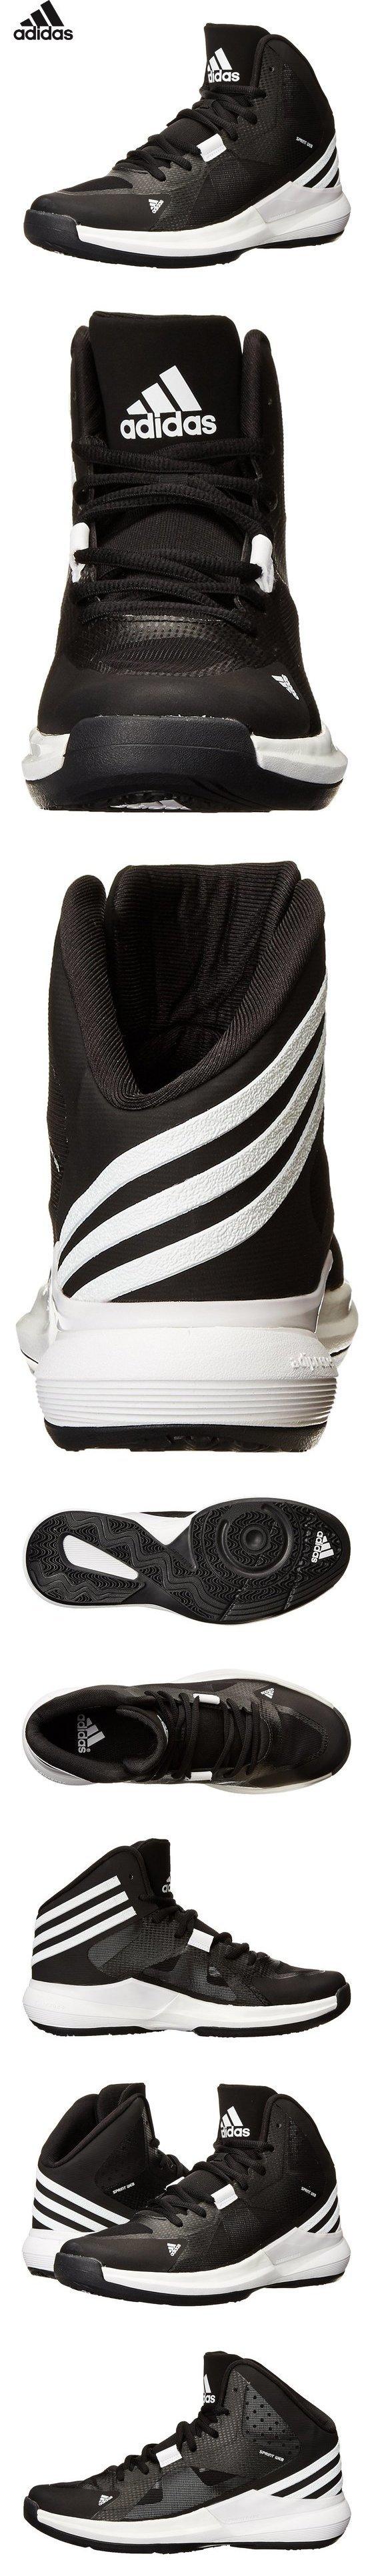 $89.99 - adidas Performance Women's Crazy Strike W Basketball Shoe ...